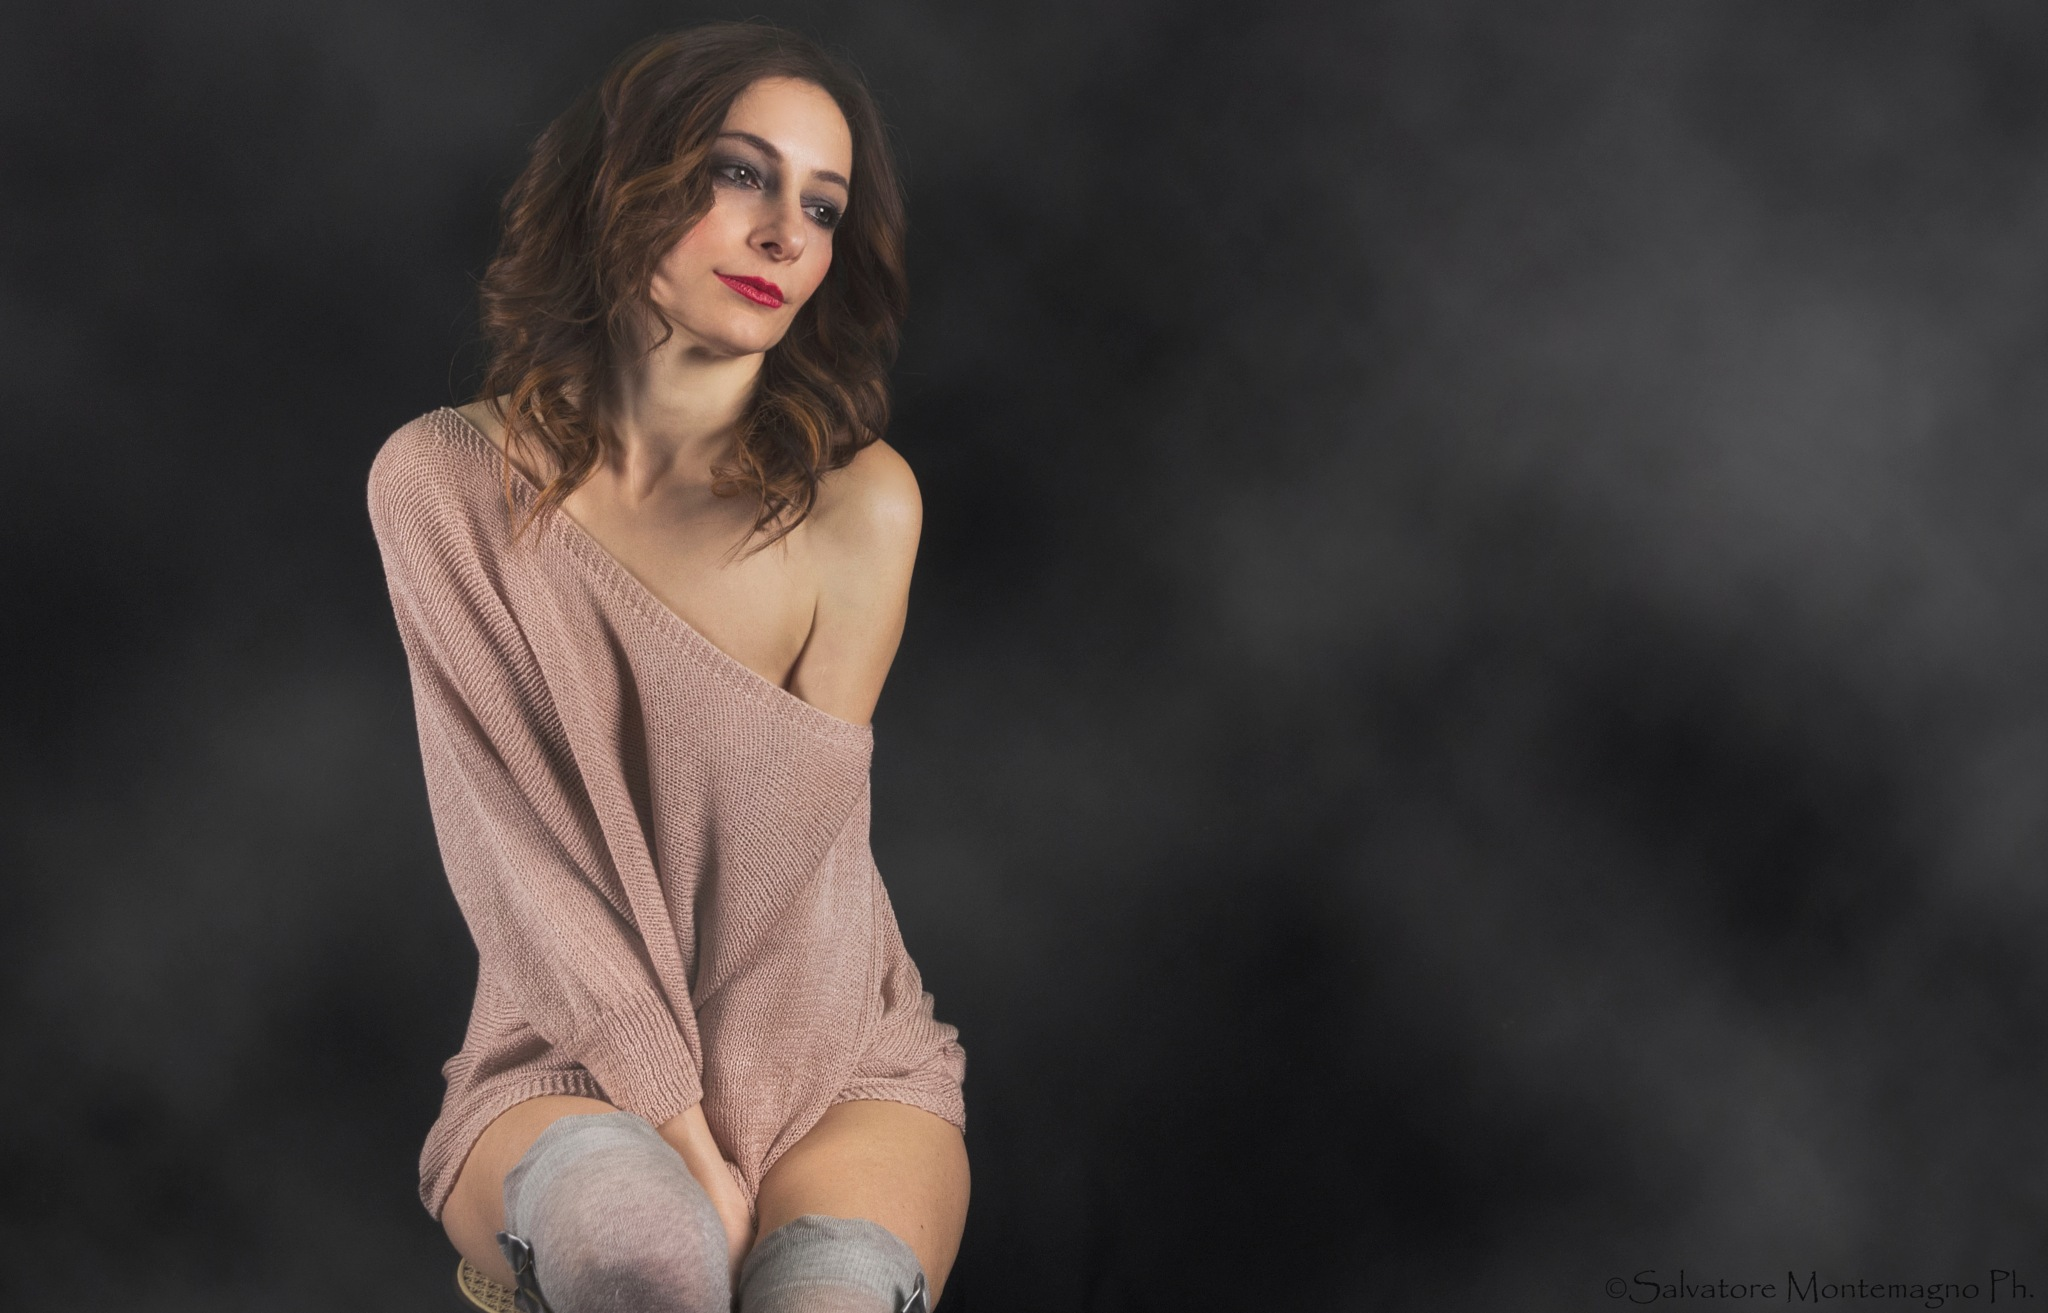 Anita by Salvatore Montemagno